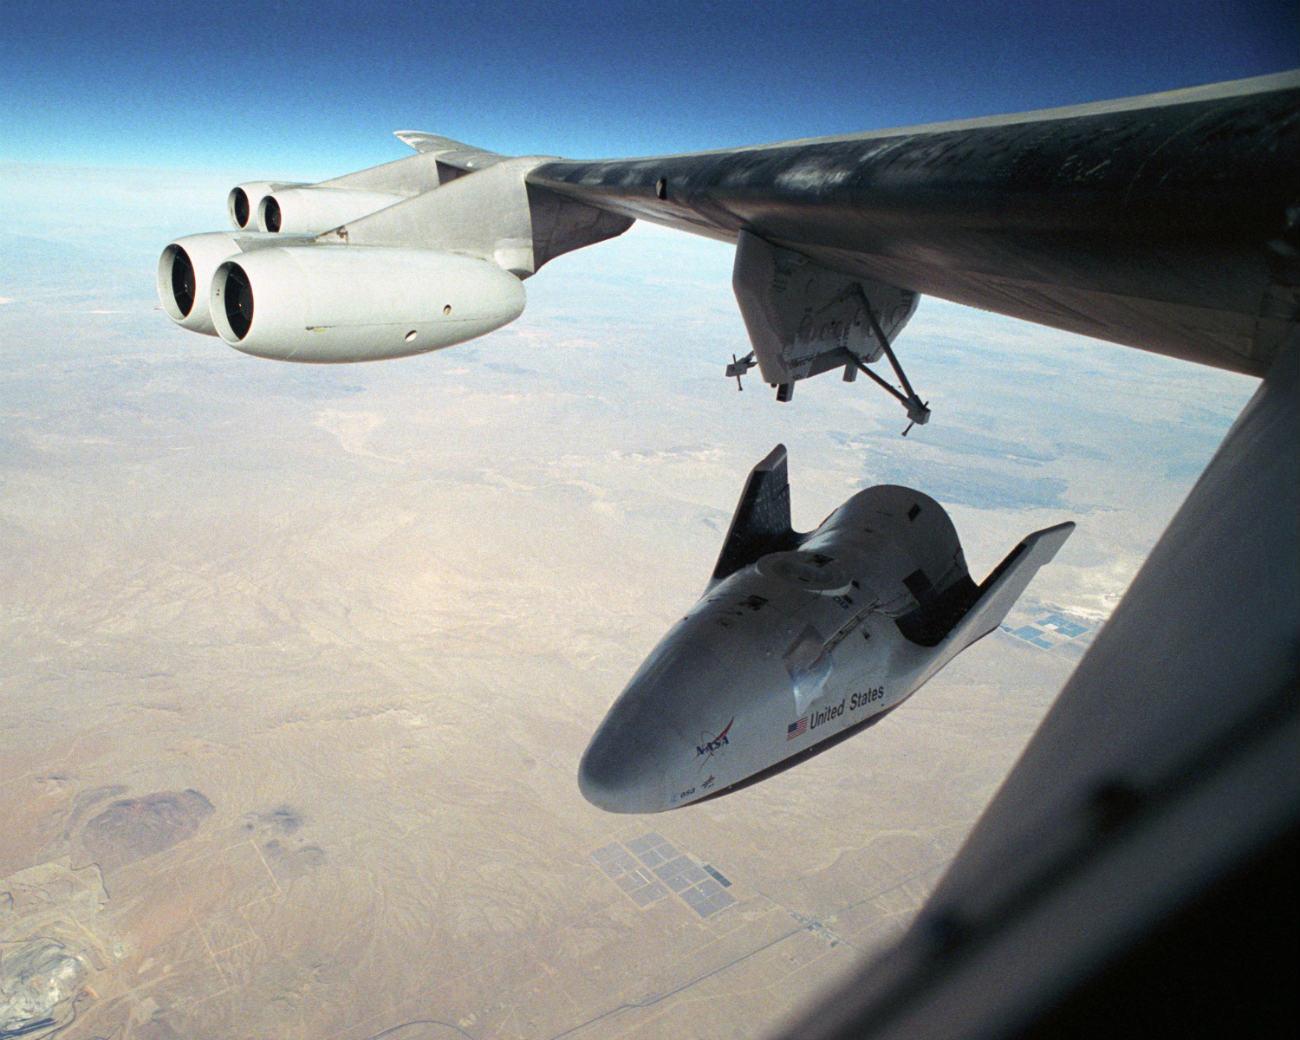 X-38 Crew Return Vehicle cruising altitude